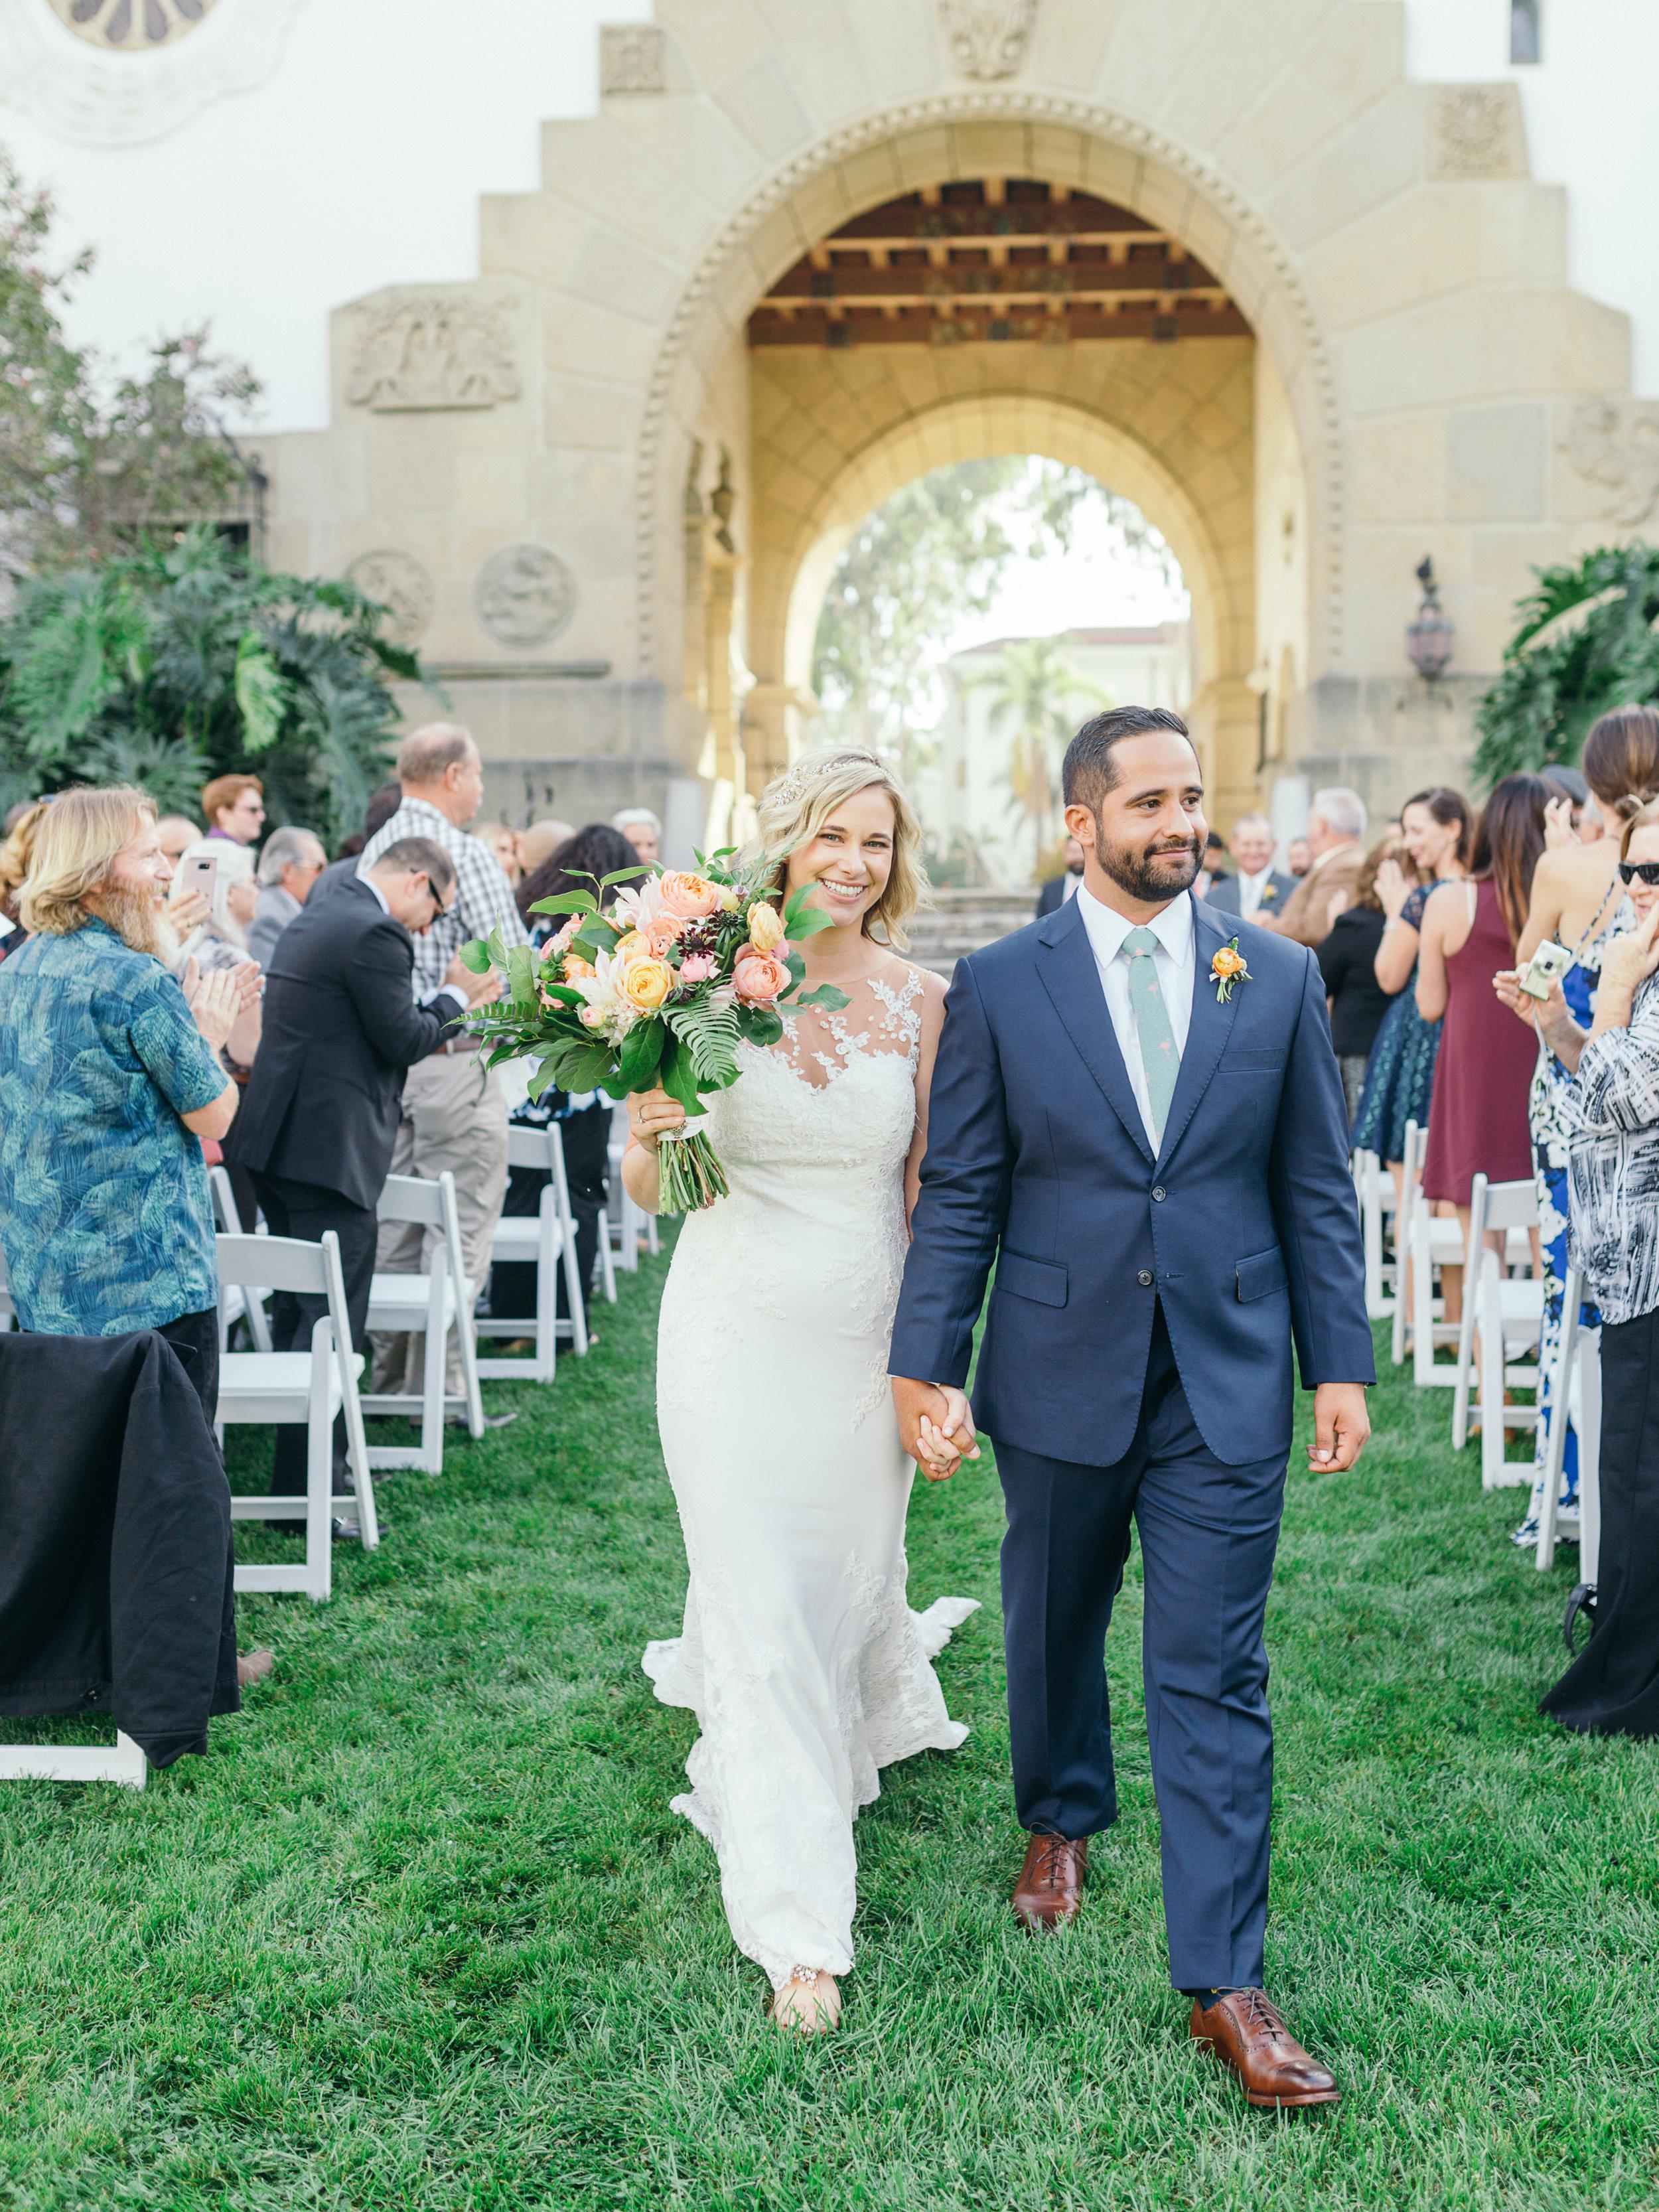 www.santabarbarawedding.com | Kiel Rucker | Riviera Mansion | Bride and Groom Walking Down Aisle